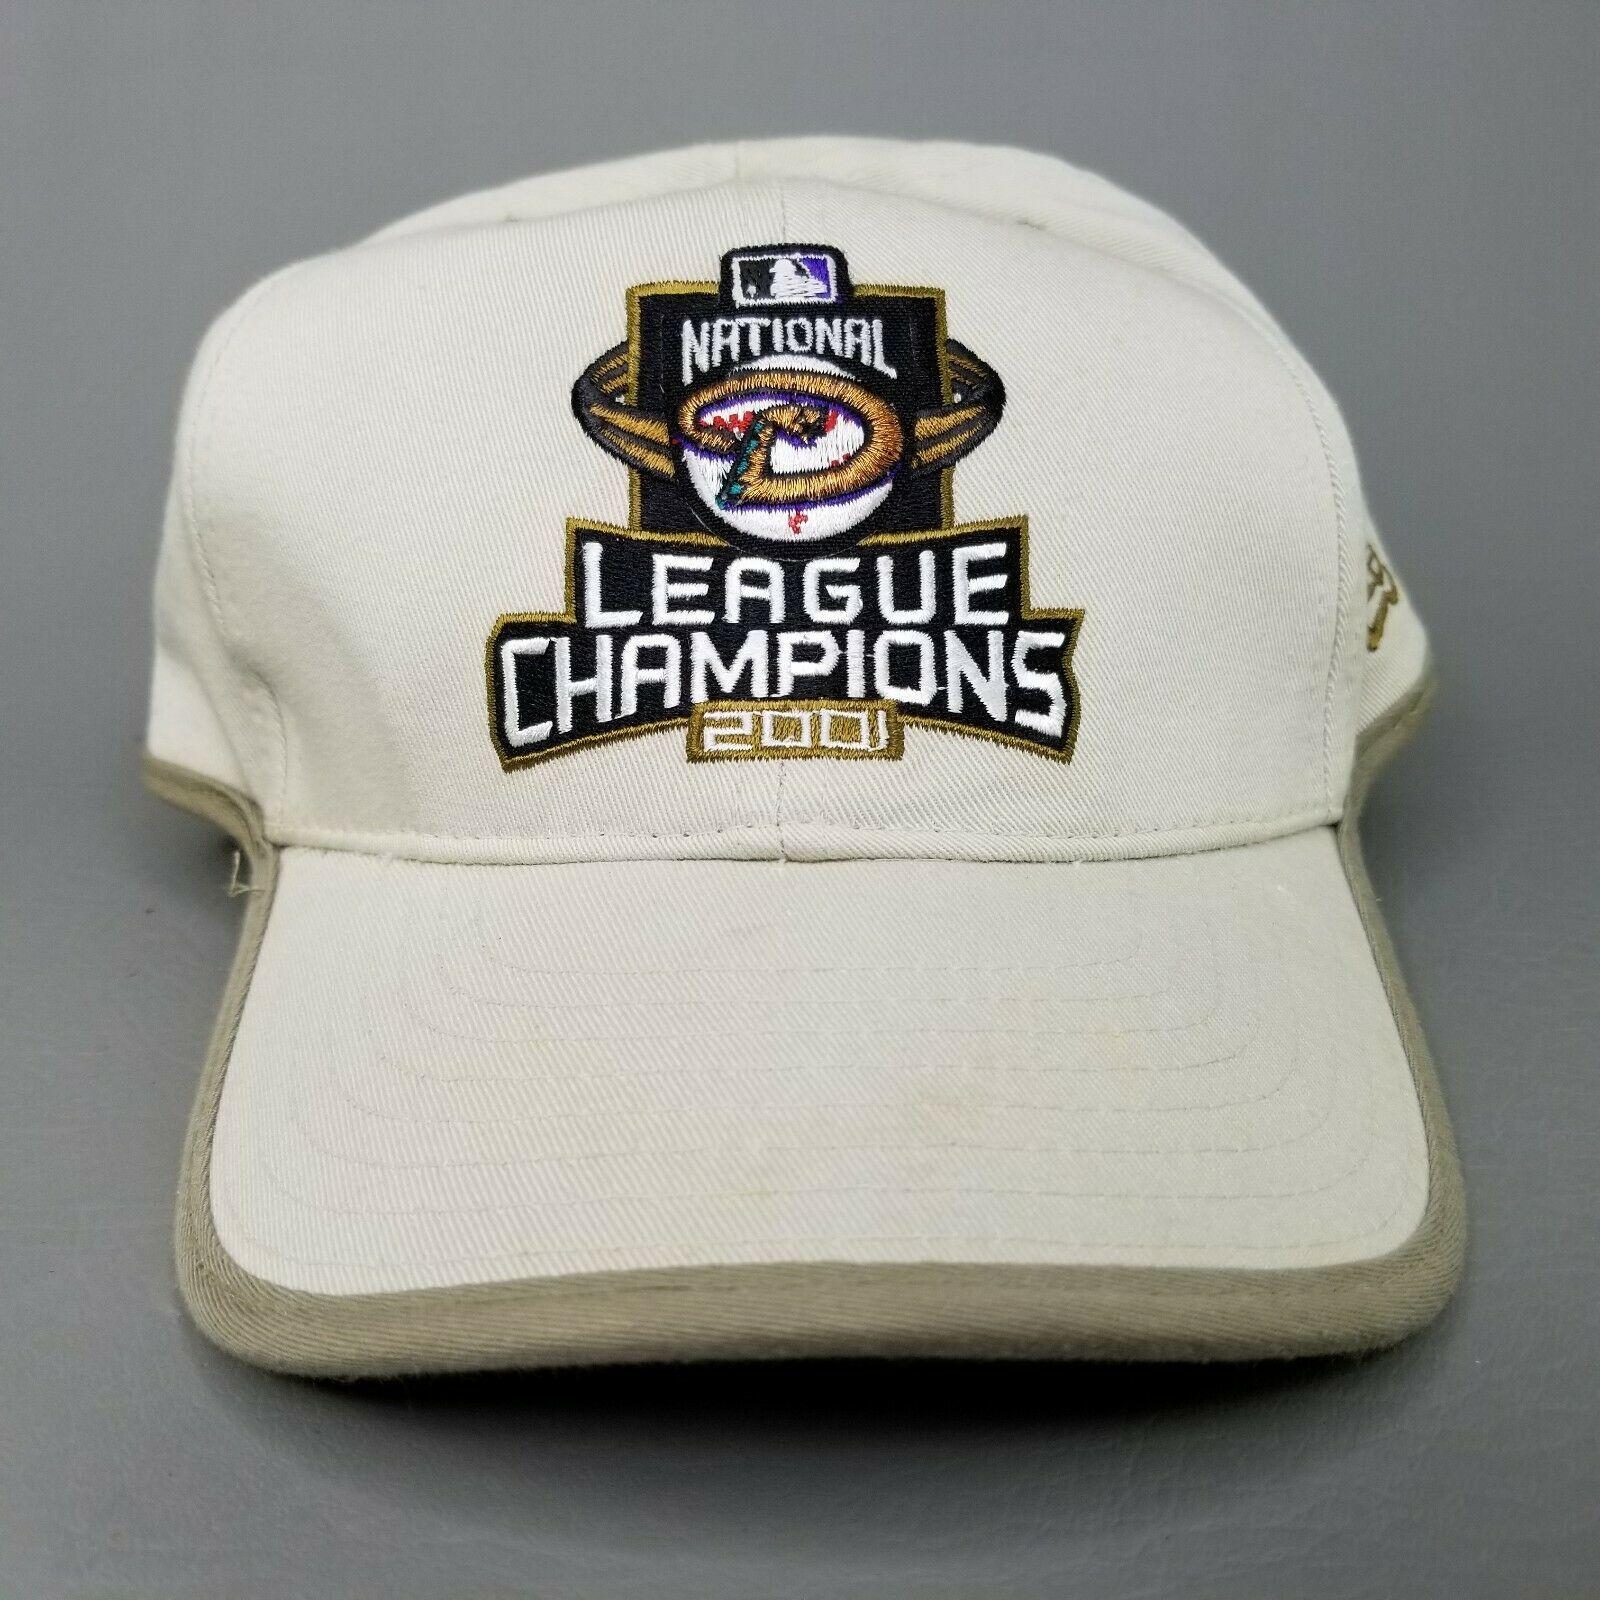 Arizona Diamondbacks New Era Baseball Hat 2001 League Champions World Series